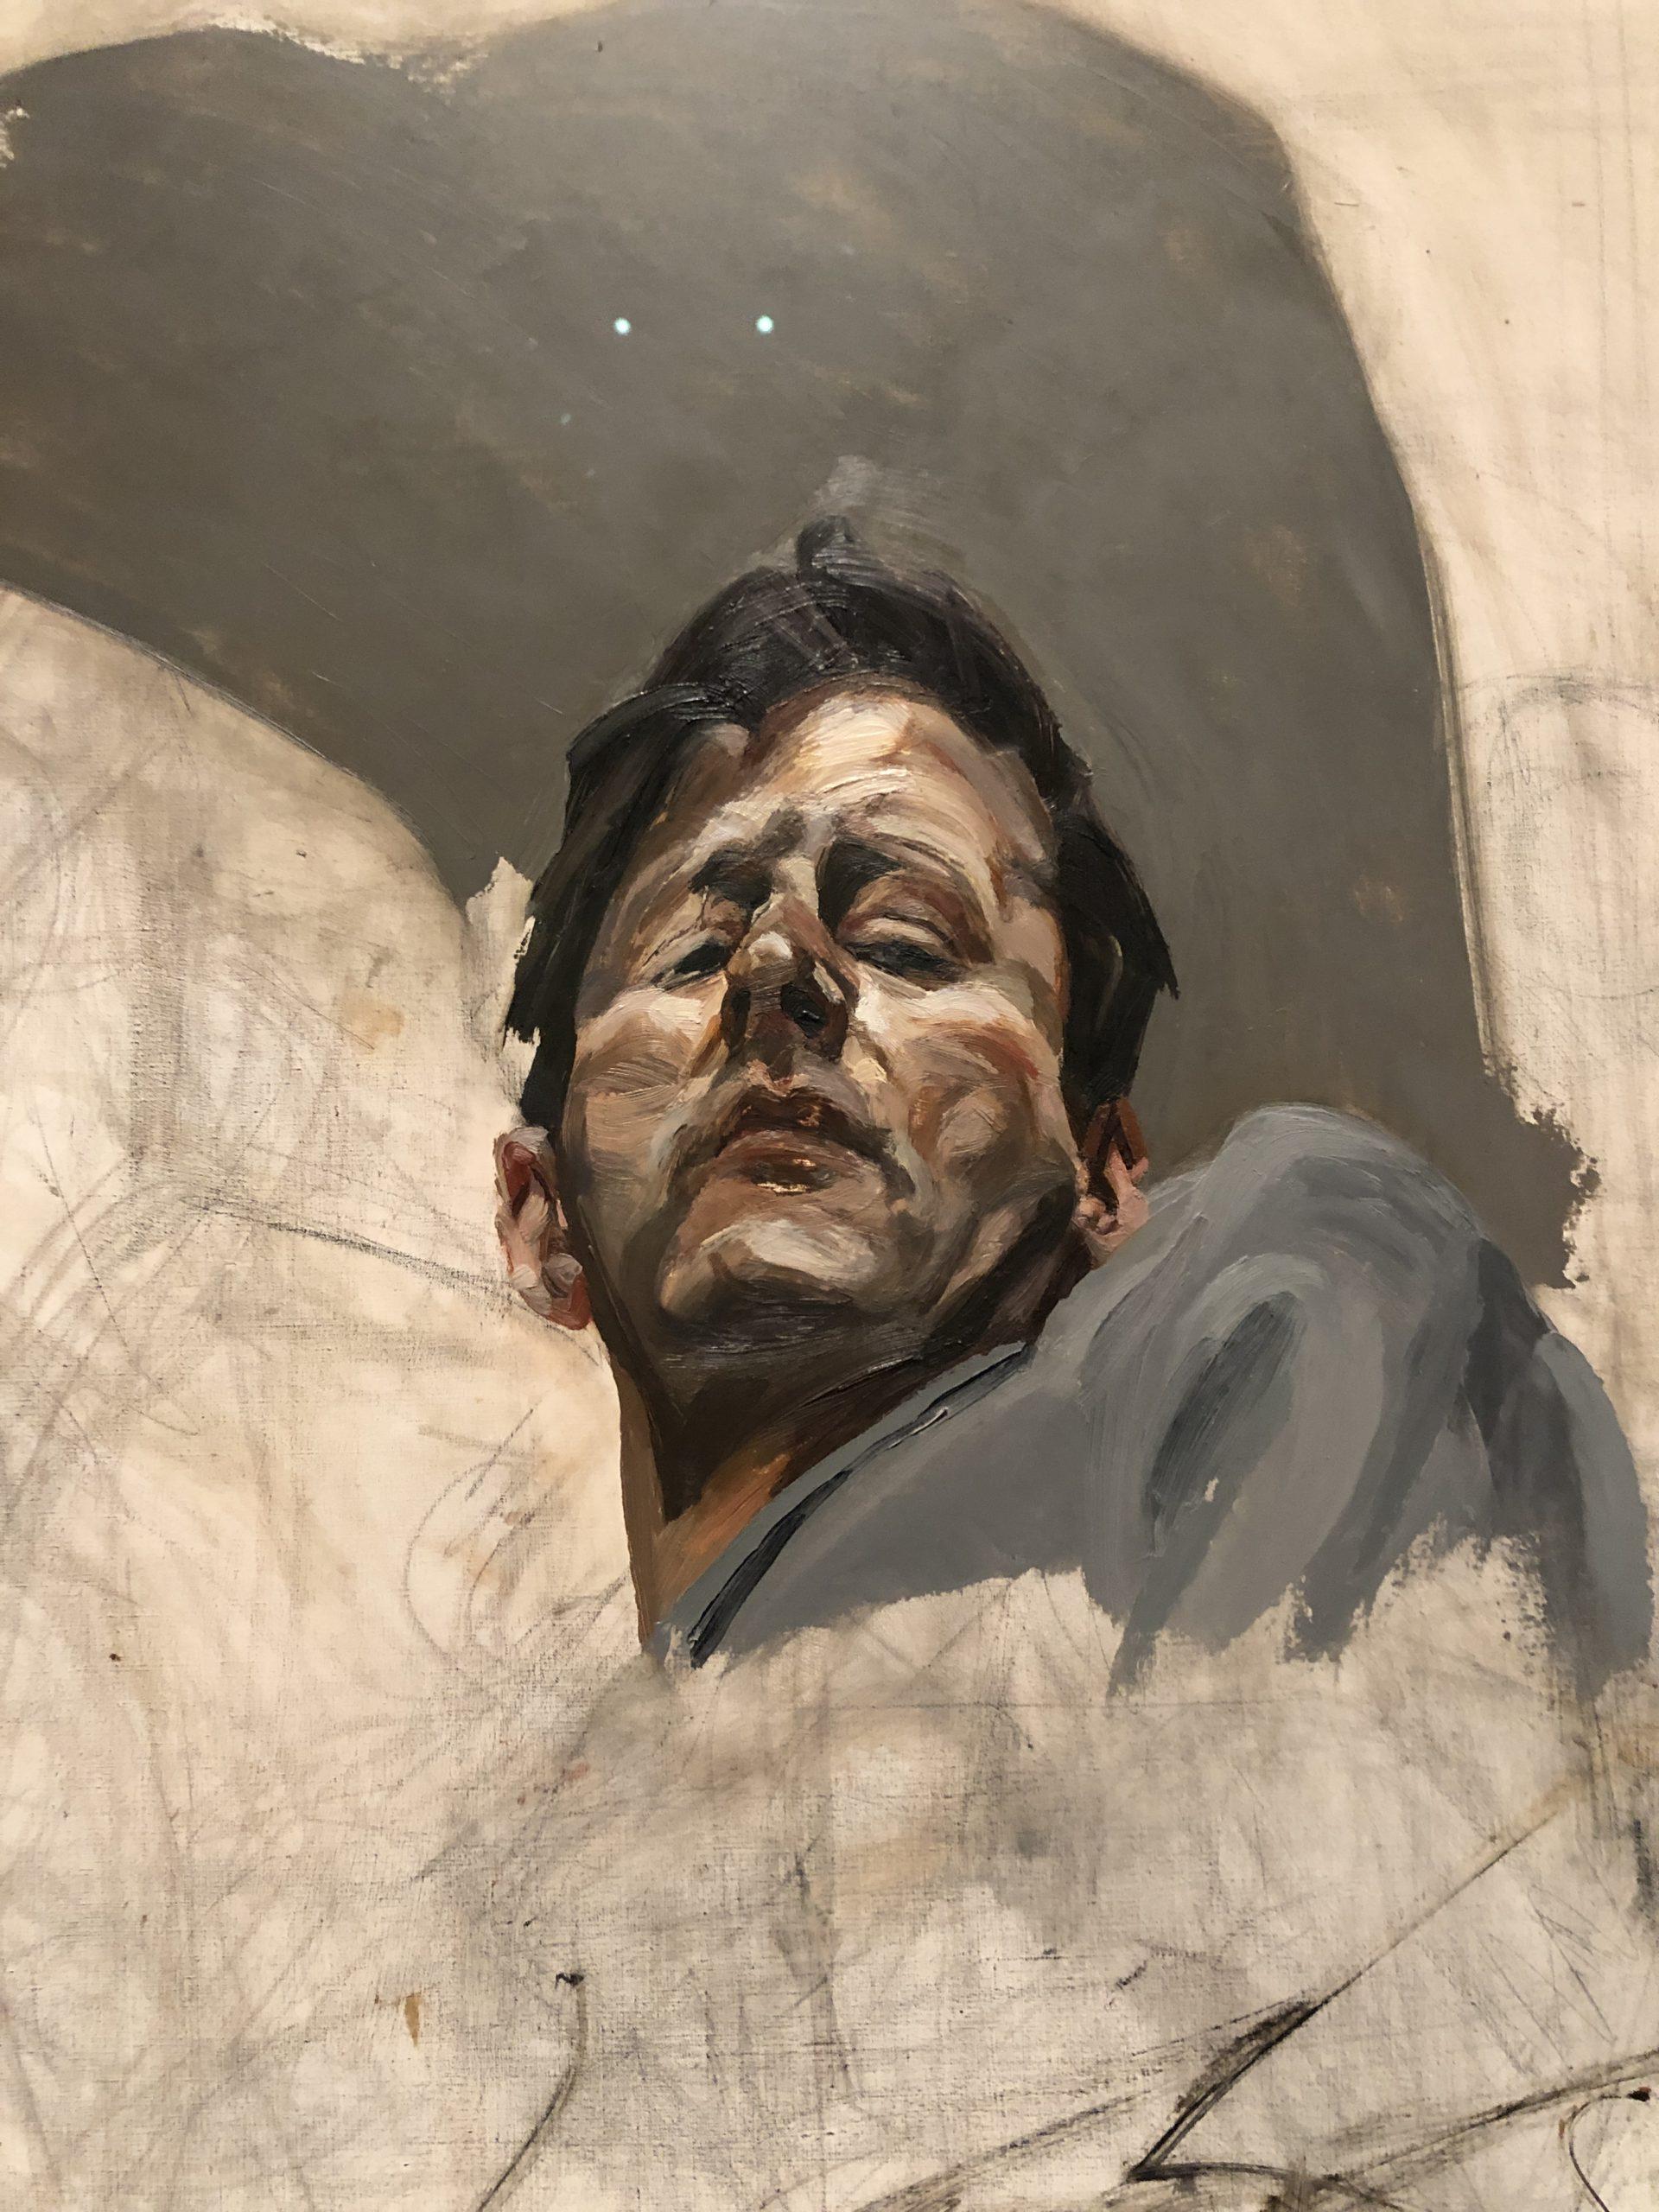 Image of artwork titled Self-portrait reflection fragment by artist Lucian Freud